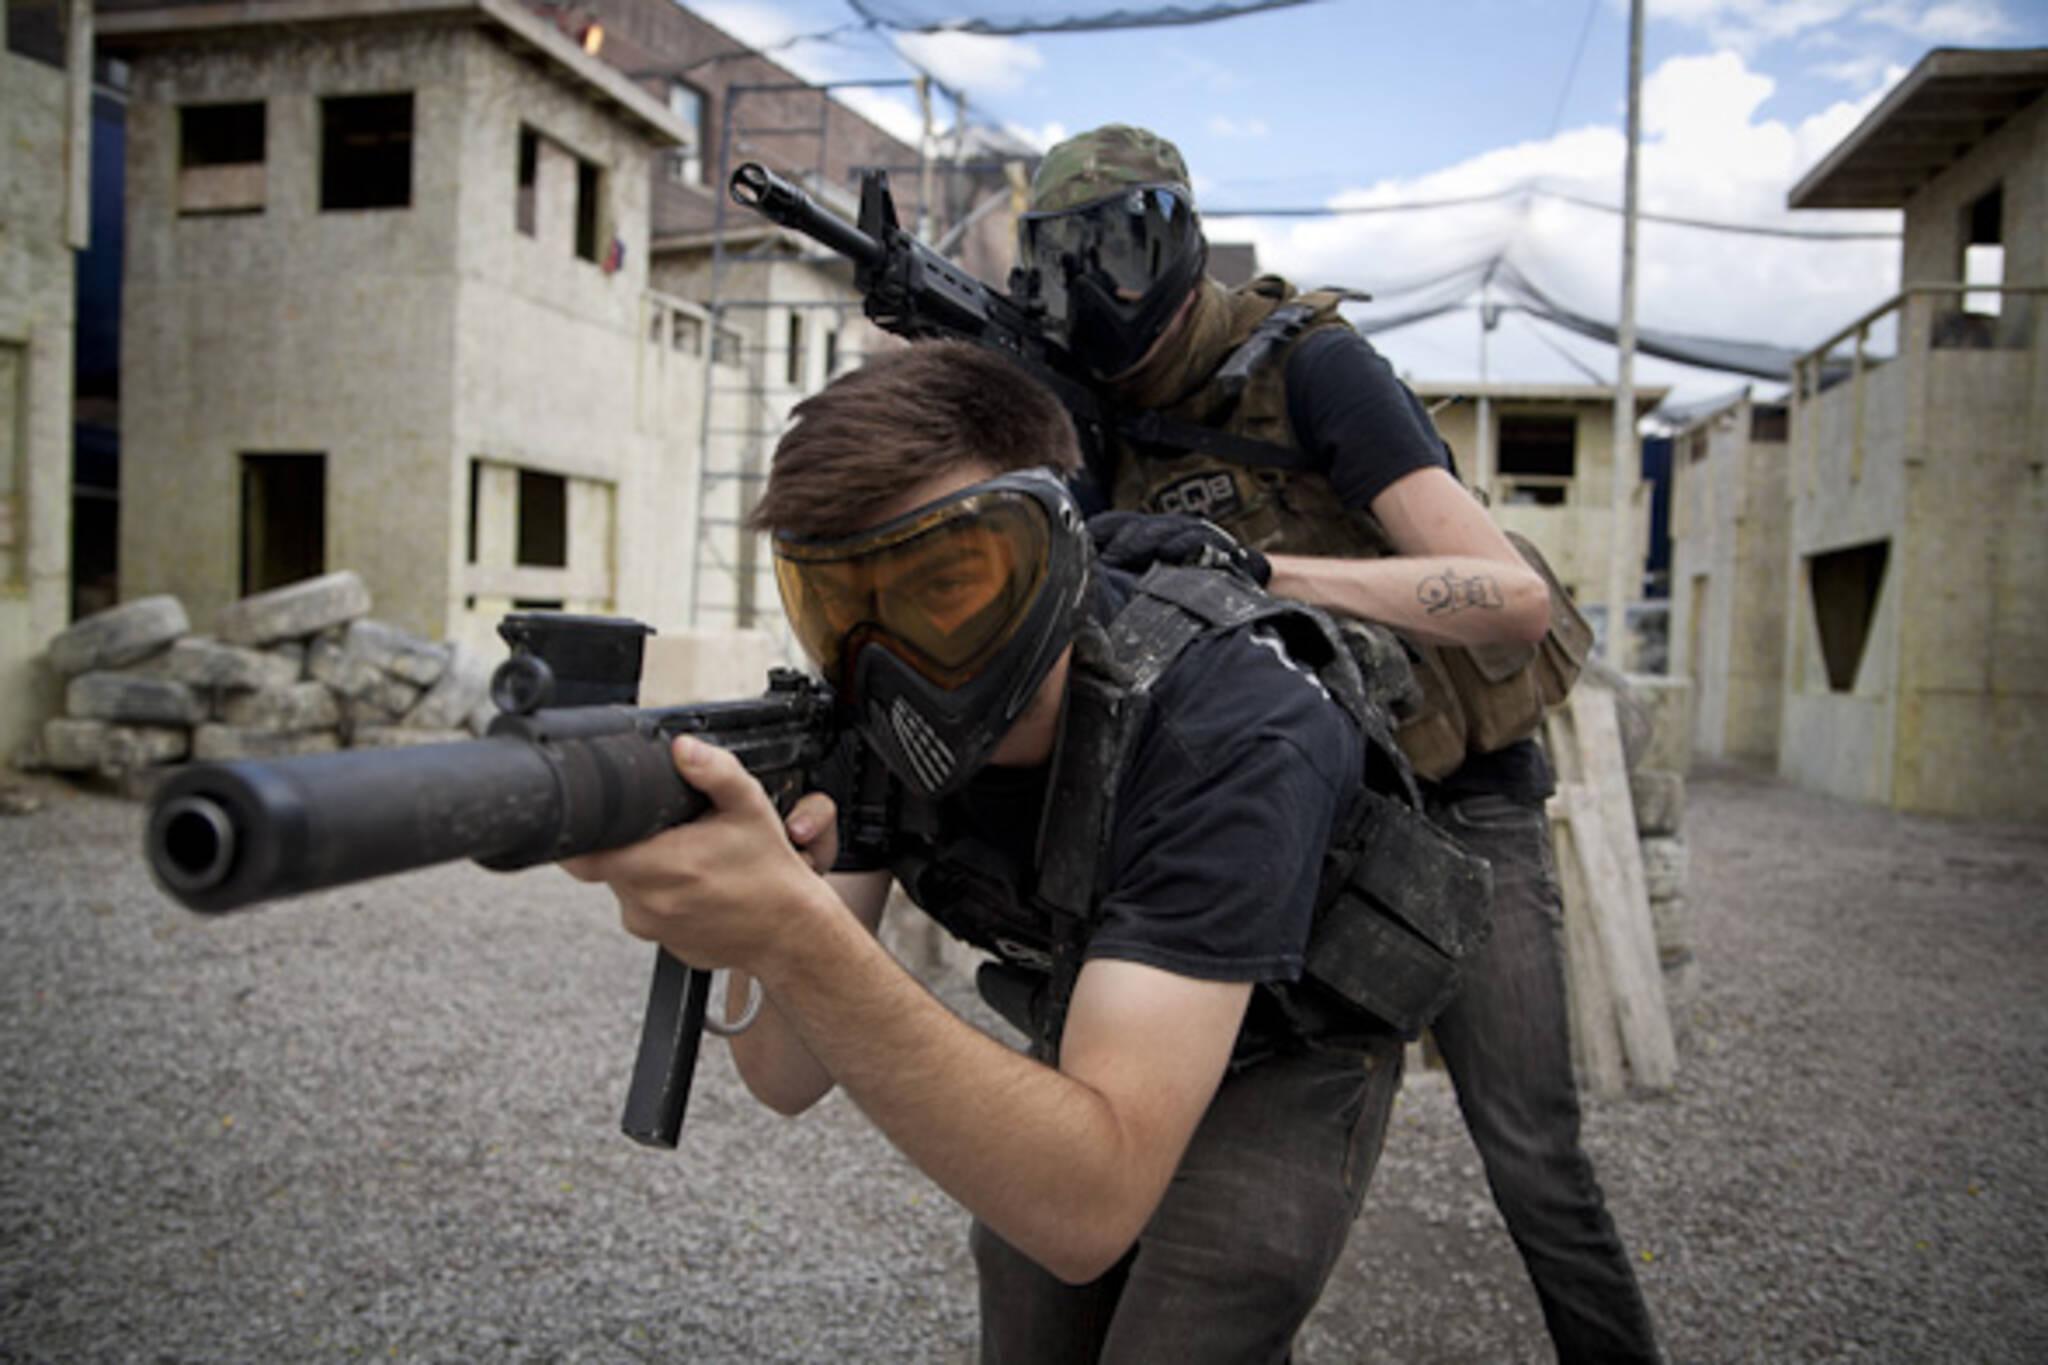 CQB Tactical Paintball & Training Academy - CLOSED - blogTO